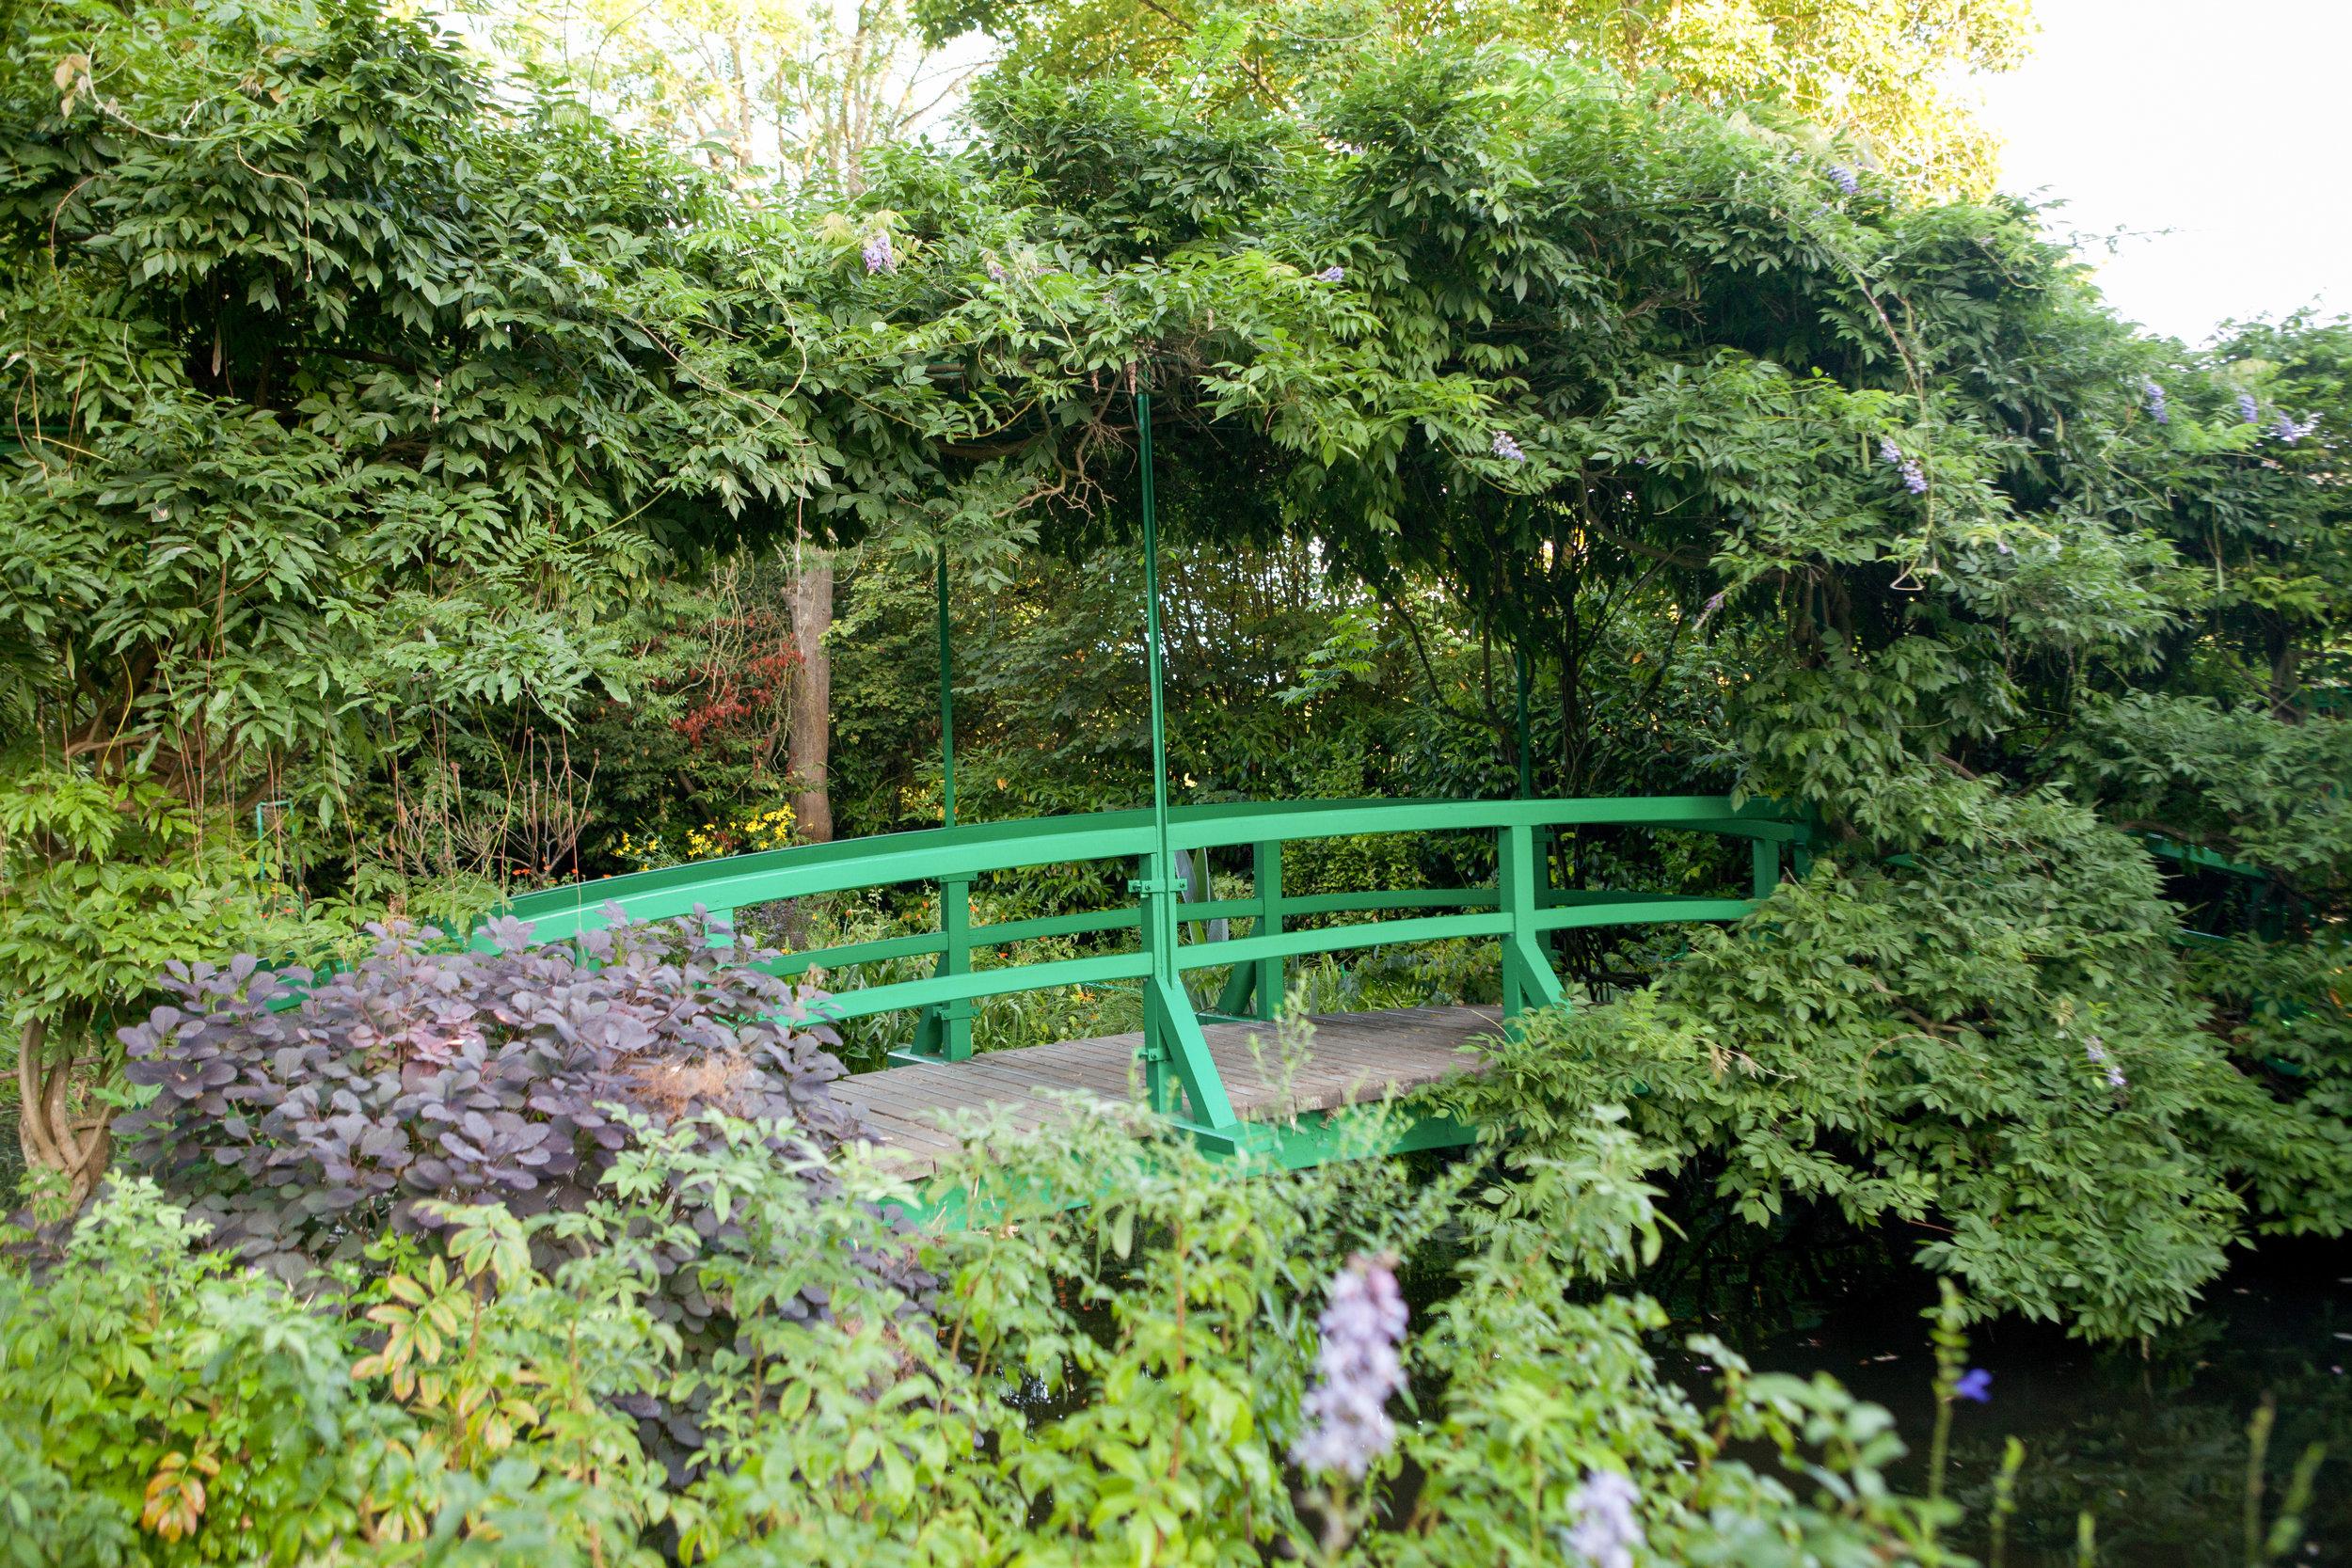 20120829-Giverny Garden.jpg